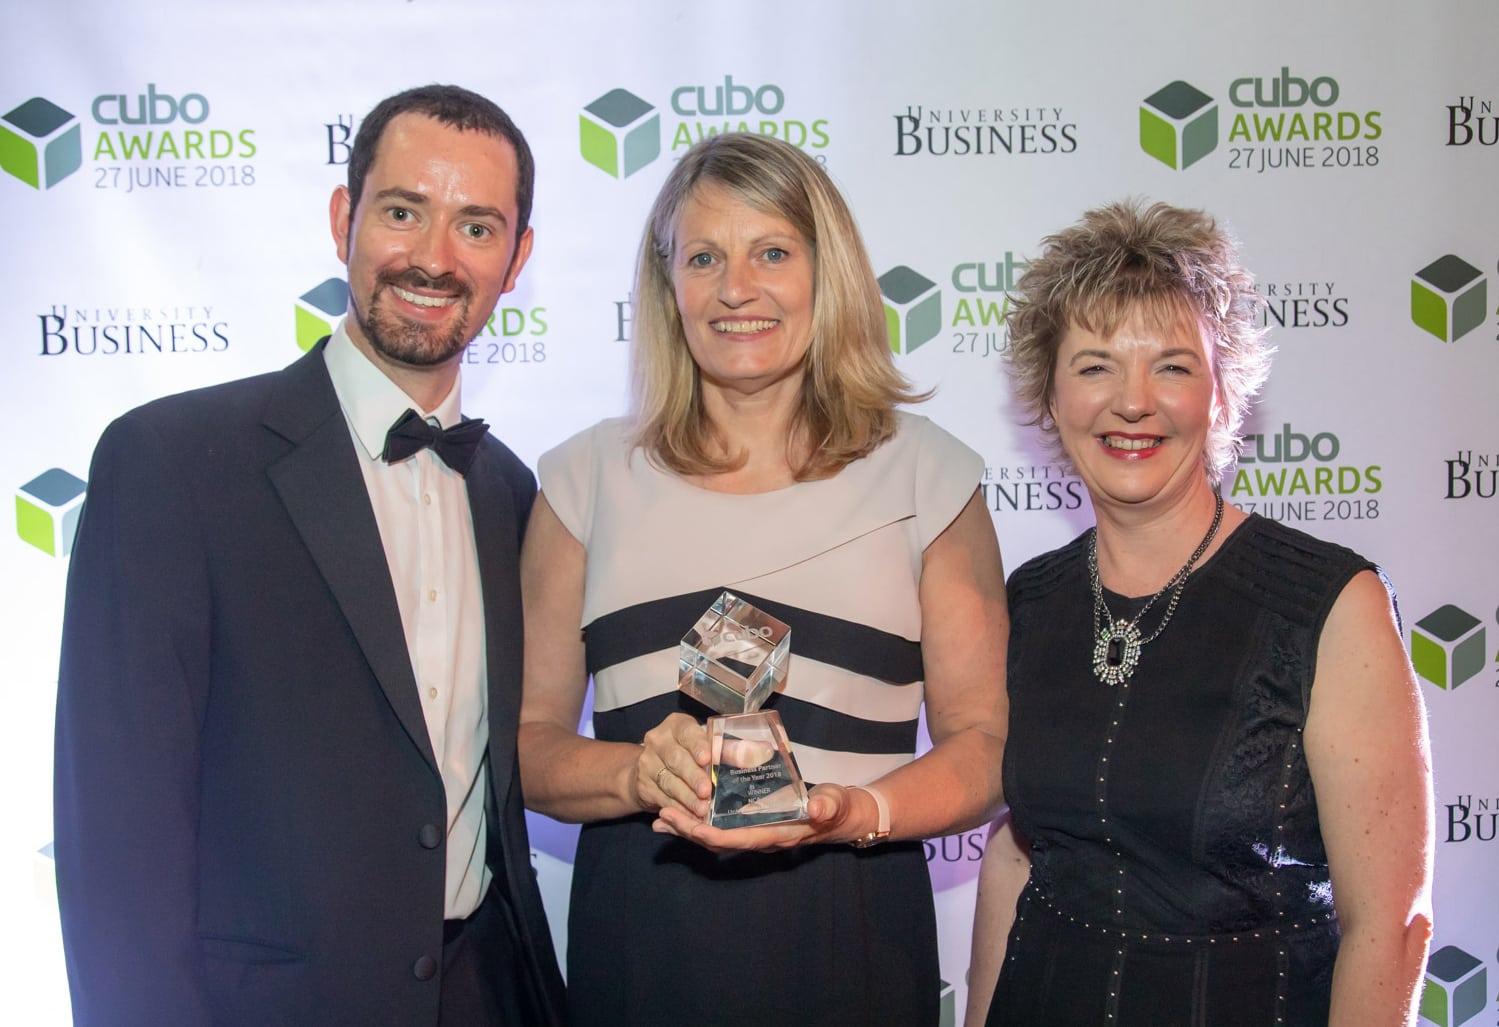 NCA Scoops a CUBO Award in 2018